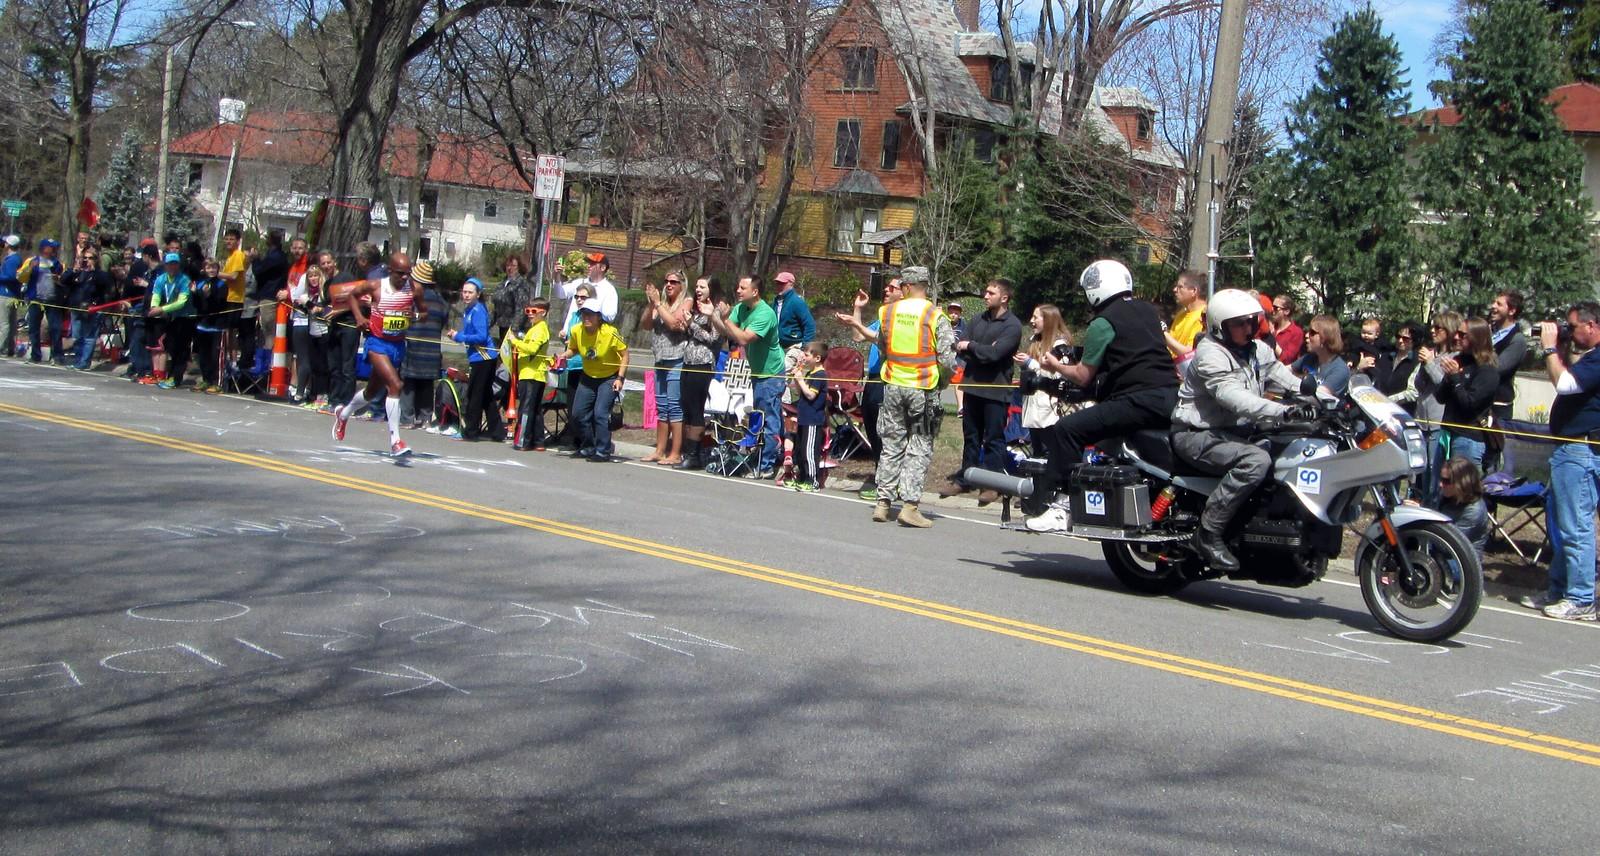 Meb Keflezighi Winner of the 2014 Boston Marathon on Heartbreak Hill